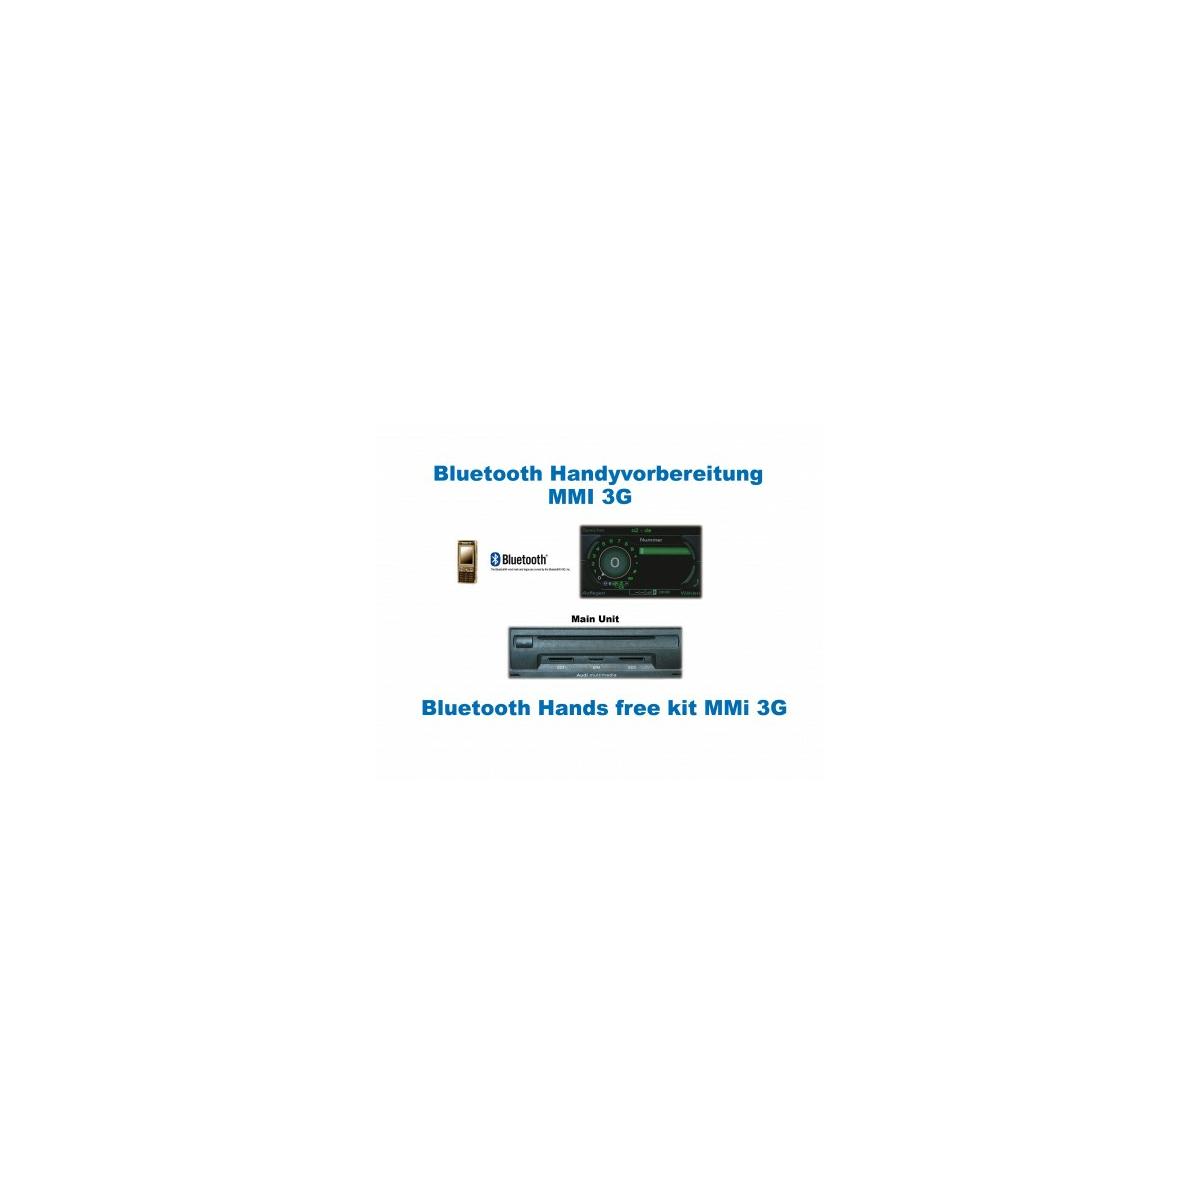 upgrade bluetooth schnittstelle audi a5 8t mmi 3g 399 00. Black Bedroom Furniture Sets. Home Design Ideas